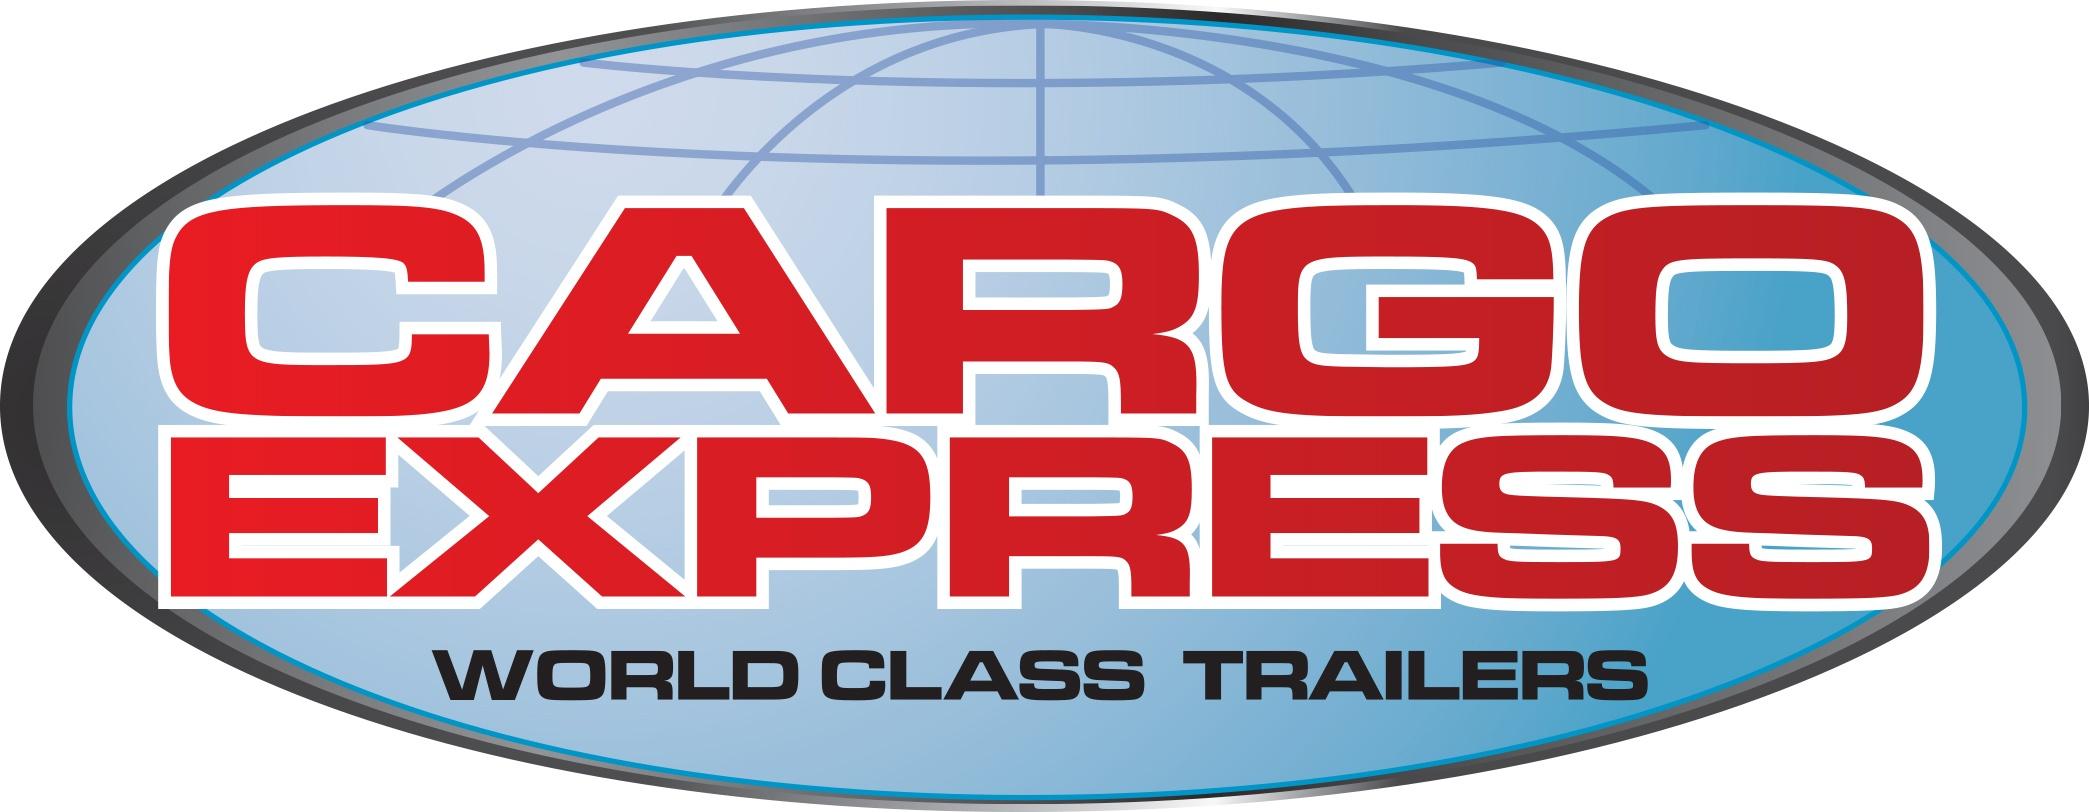 Cargo Express World Class Trailers Logo